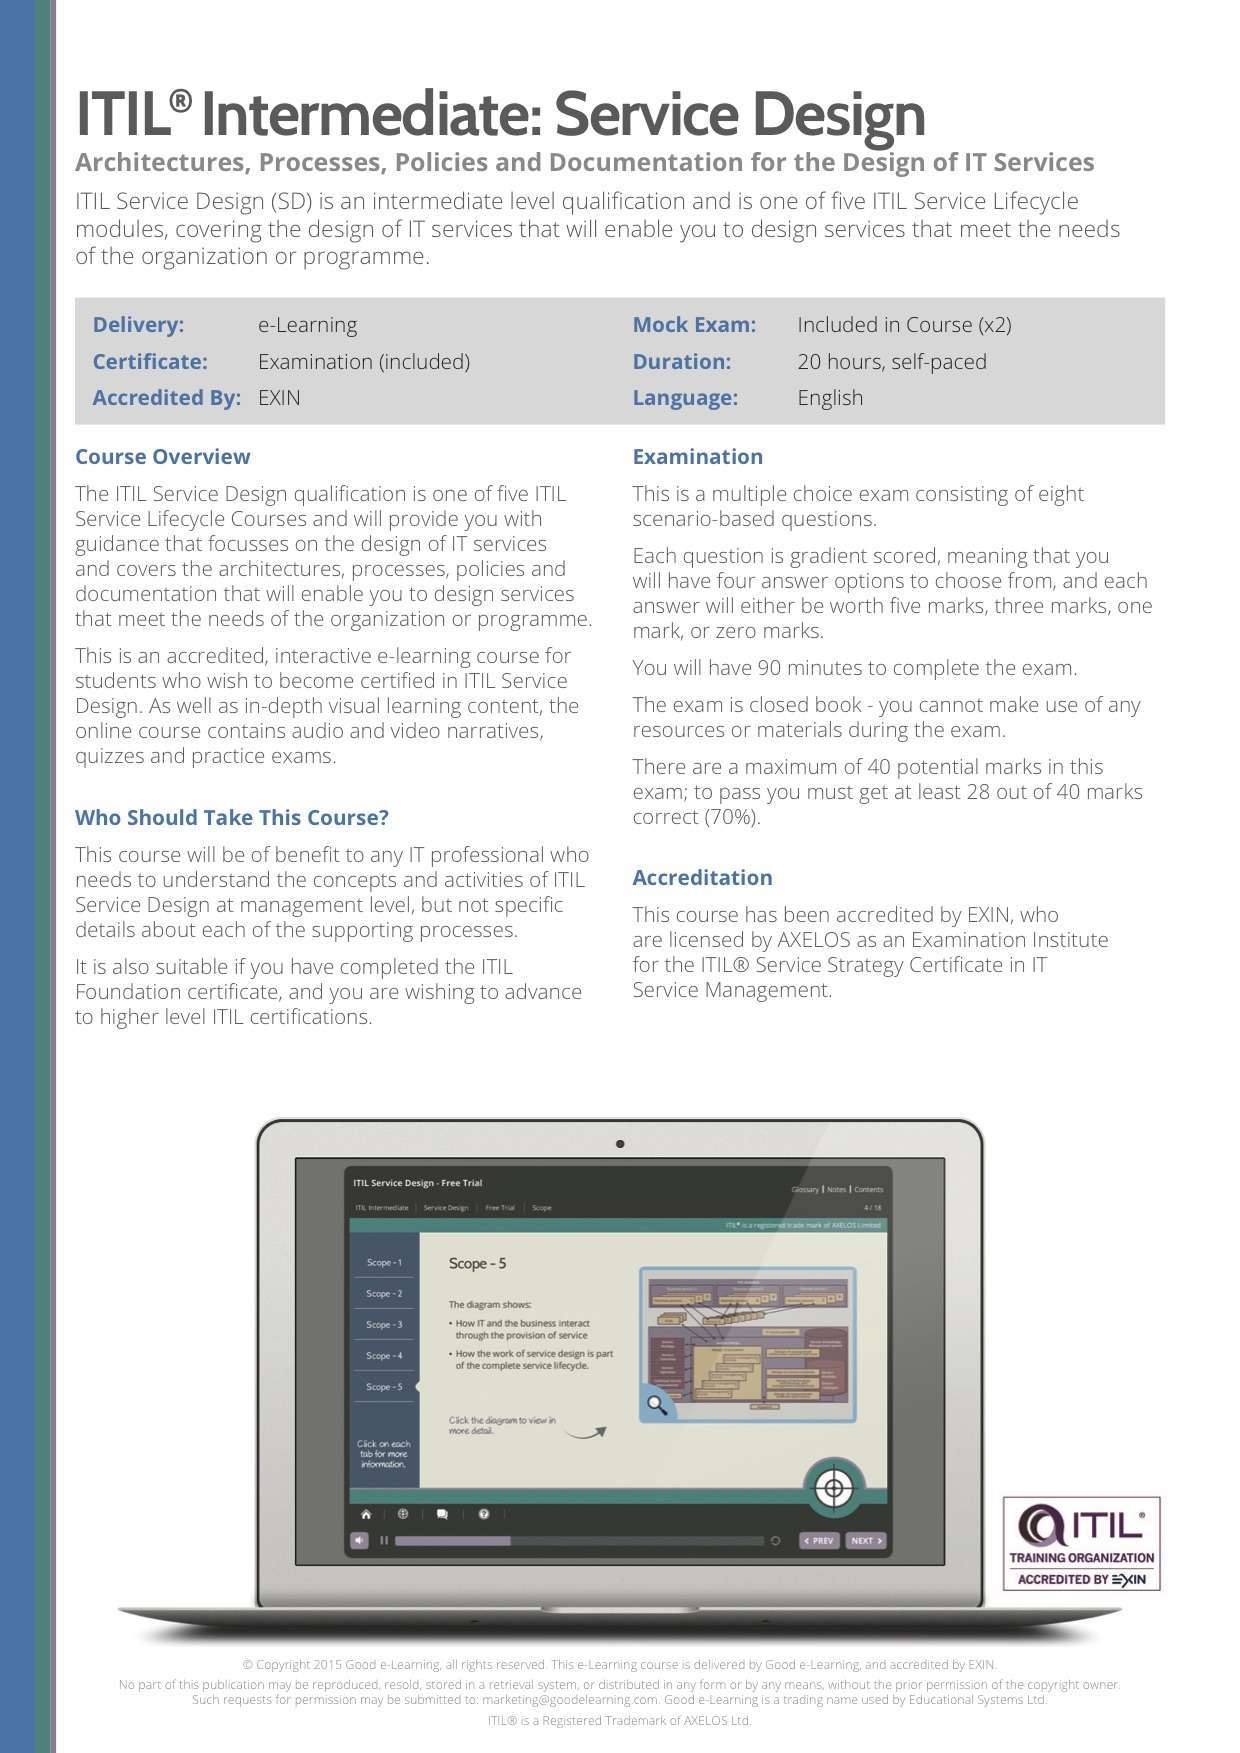 Itil Service Design Sd E Learning And Exam Oppia E